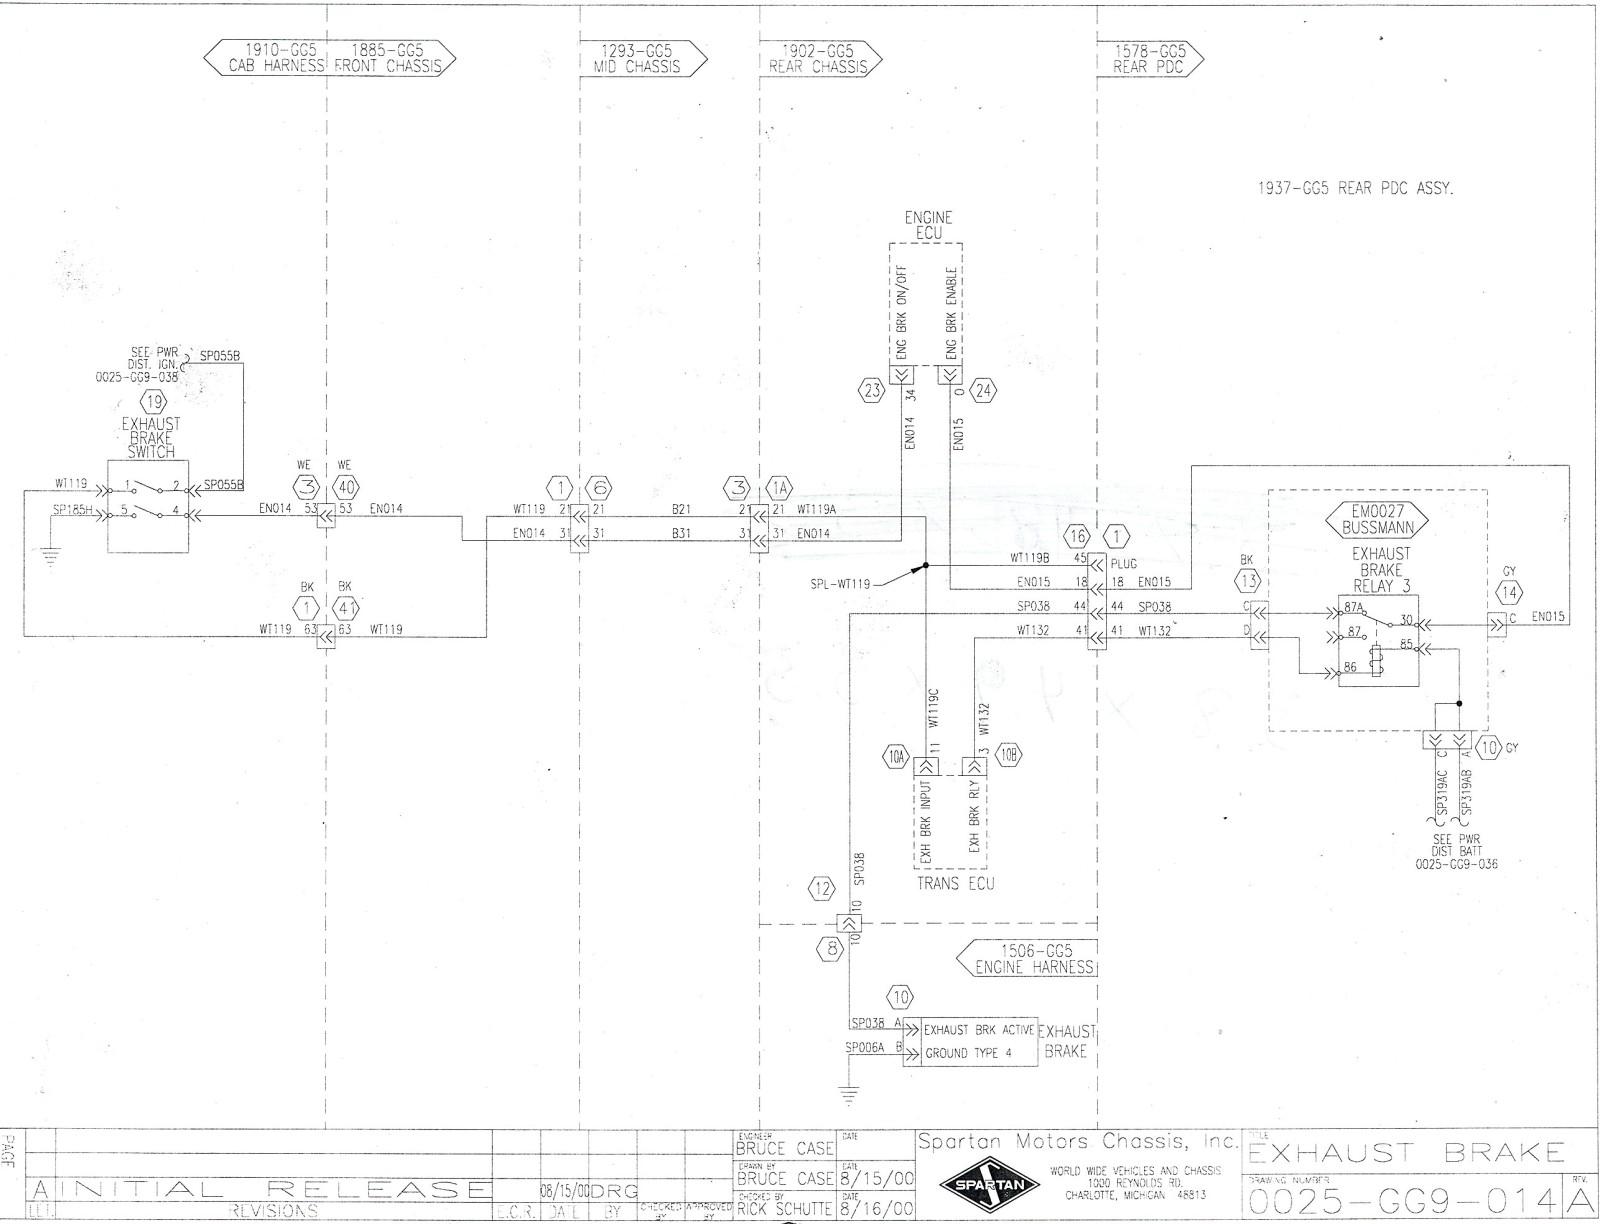 2009 subaru legacy fuse box diagram